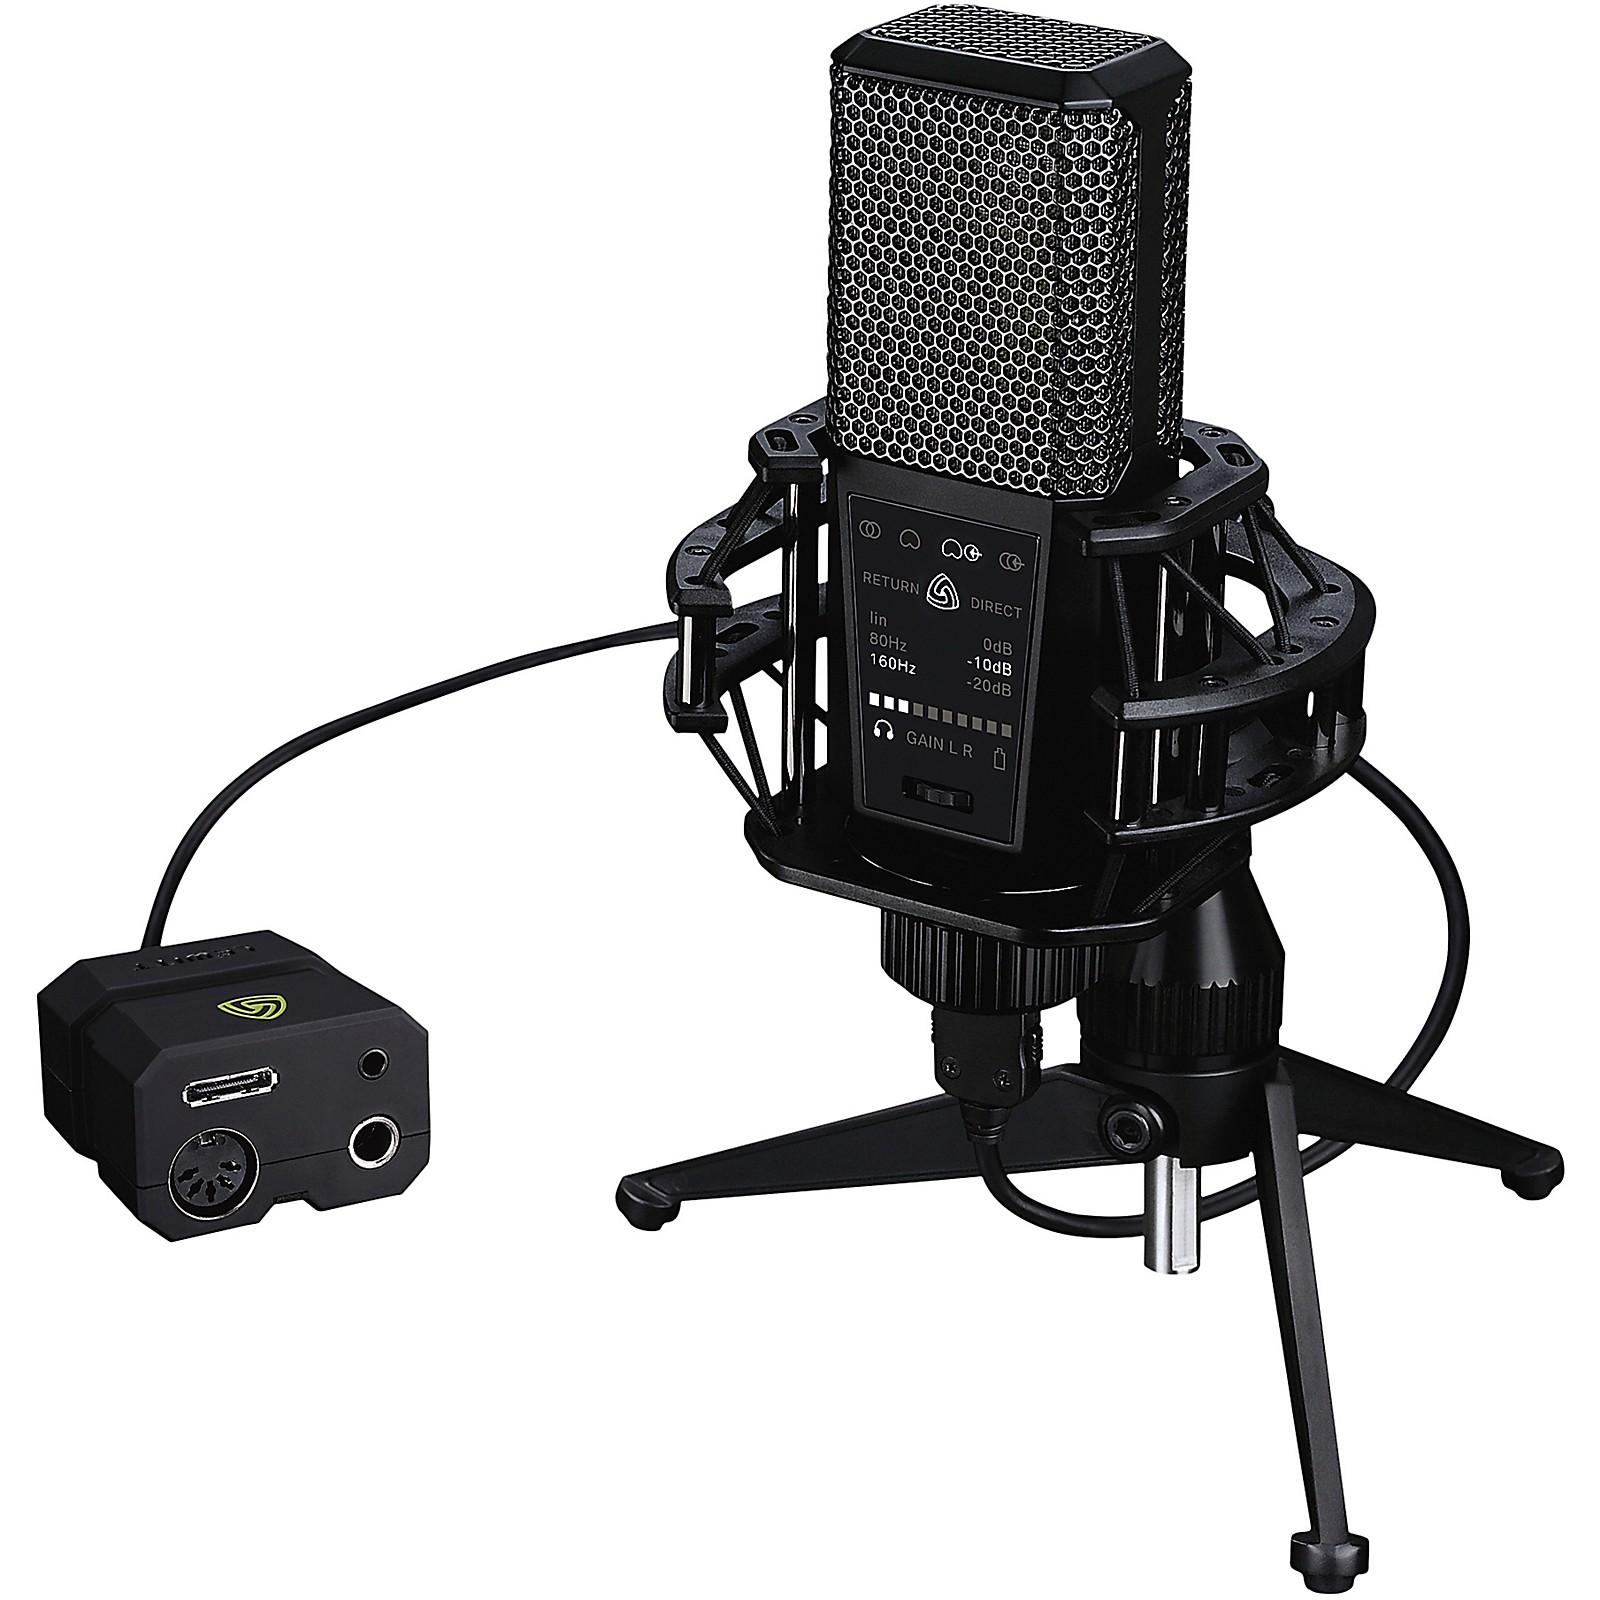 Lewitt Audio Microphones DGT 650 Stereo USB Microphone for iOS, PC, Mac